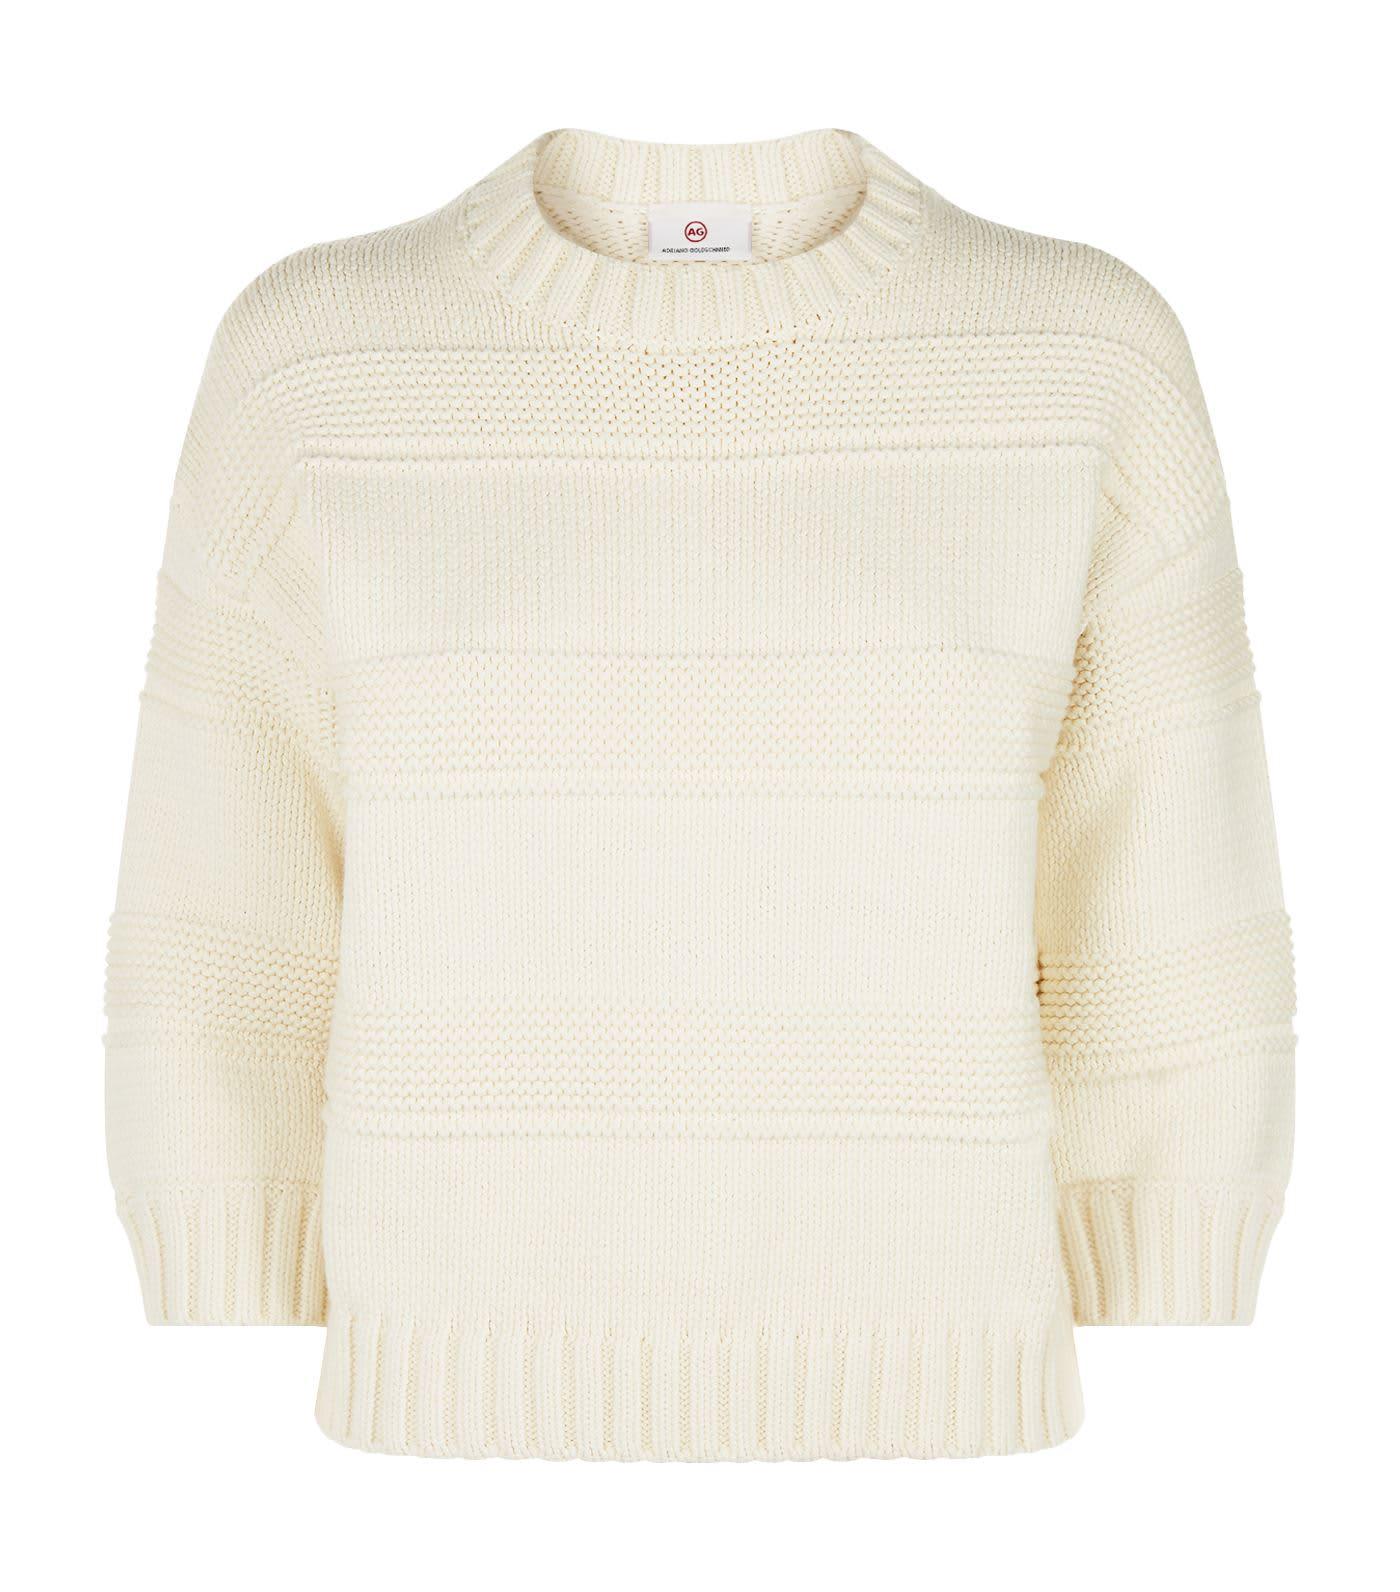 AG Jeans Sabrina Crew Neck Sweater